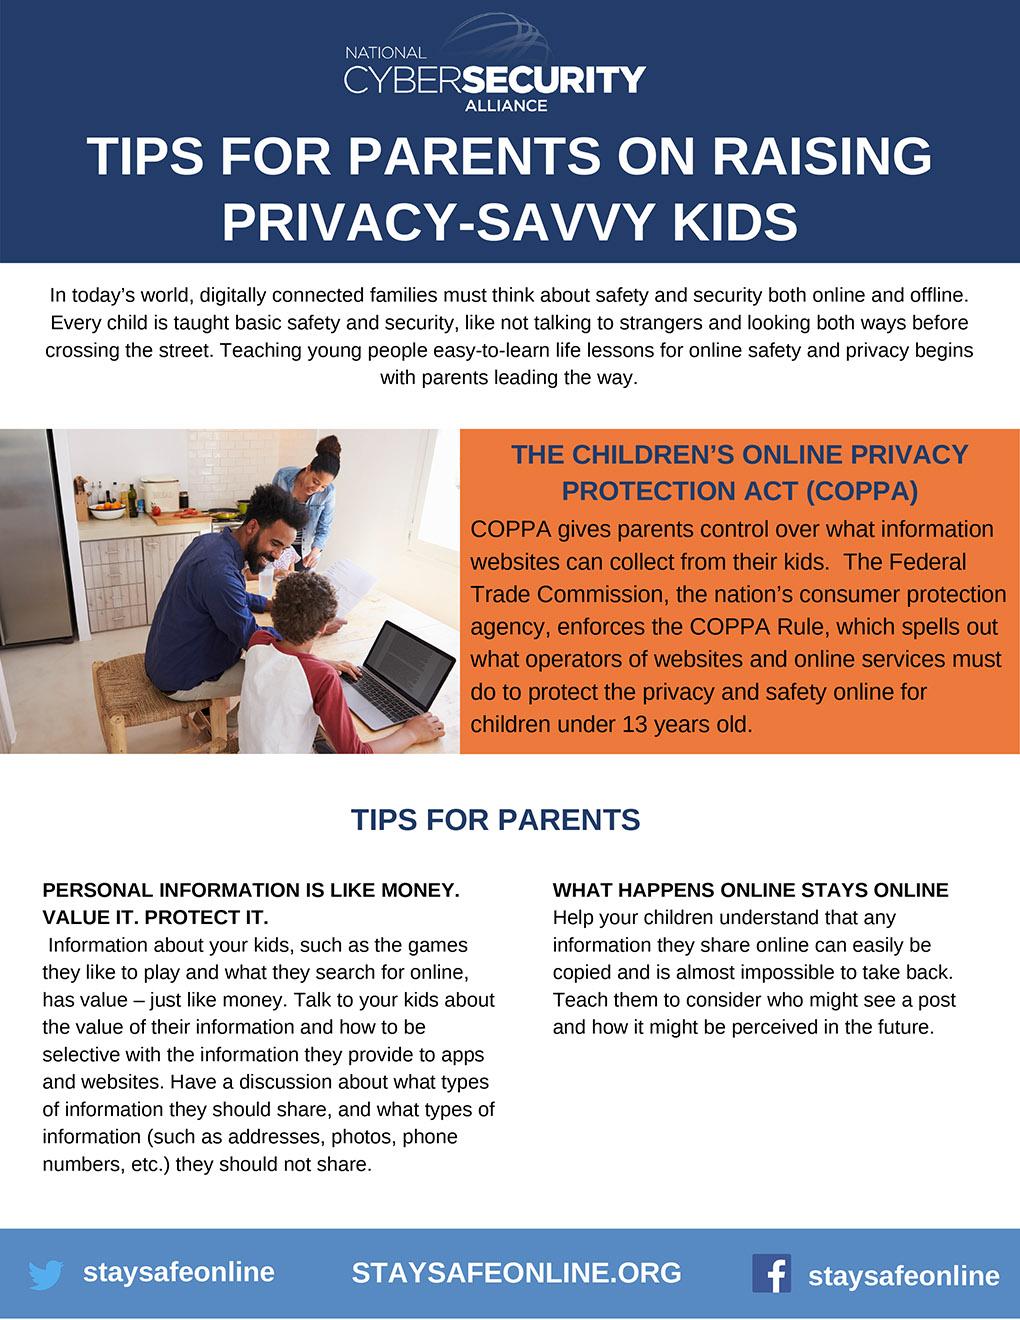 Raising Privacy-Savvy Kids